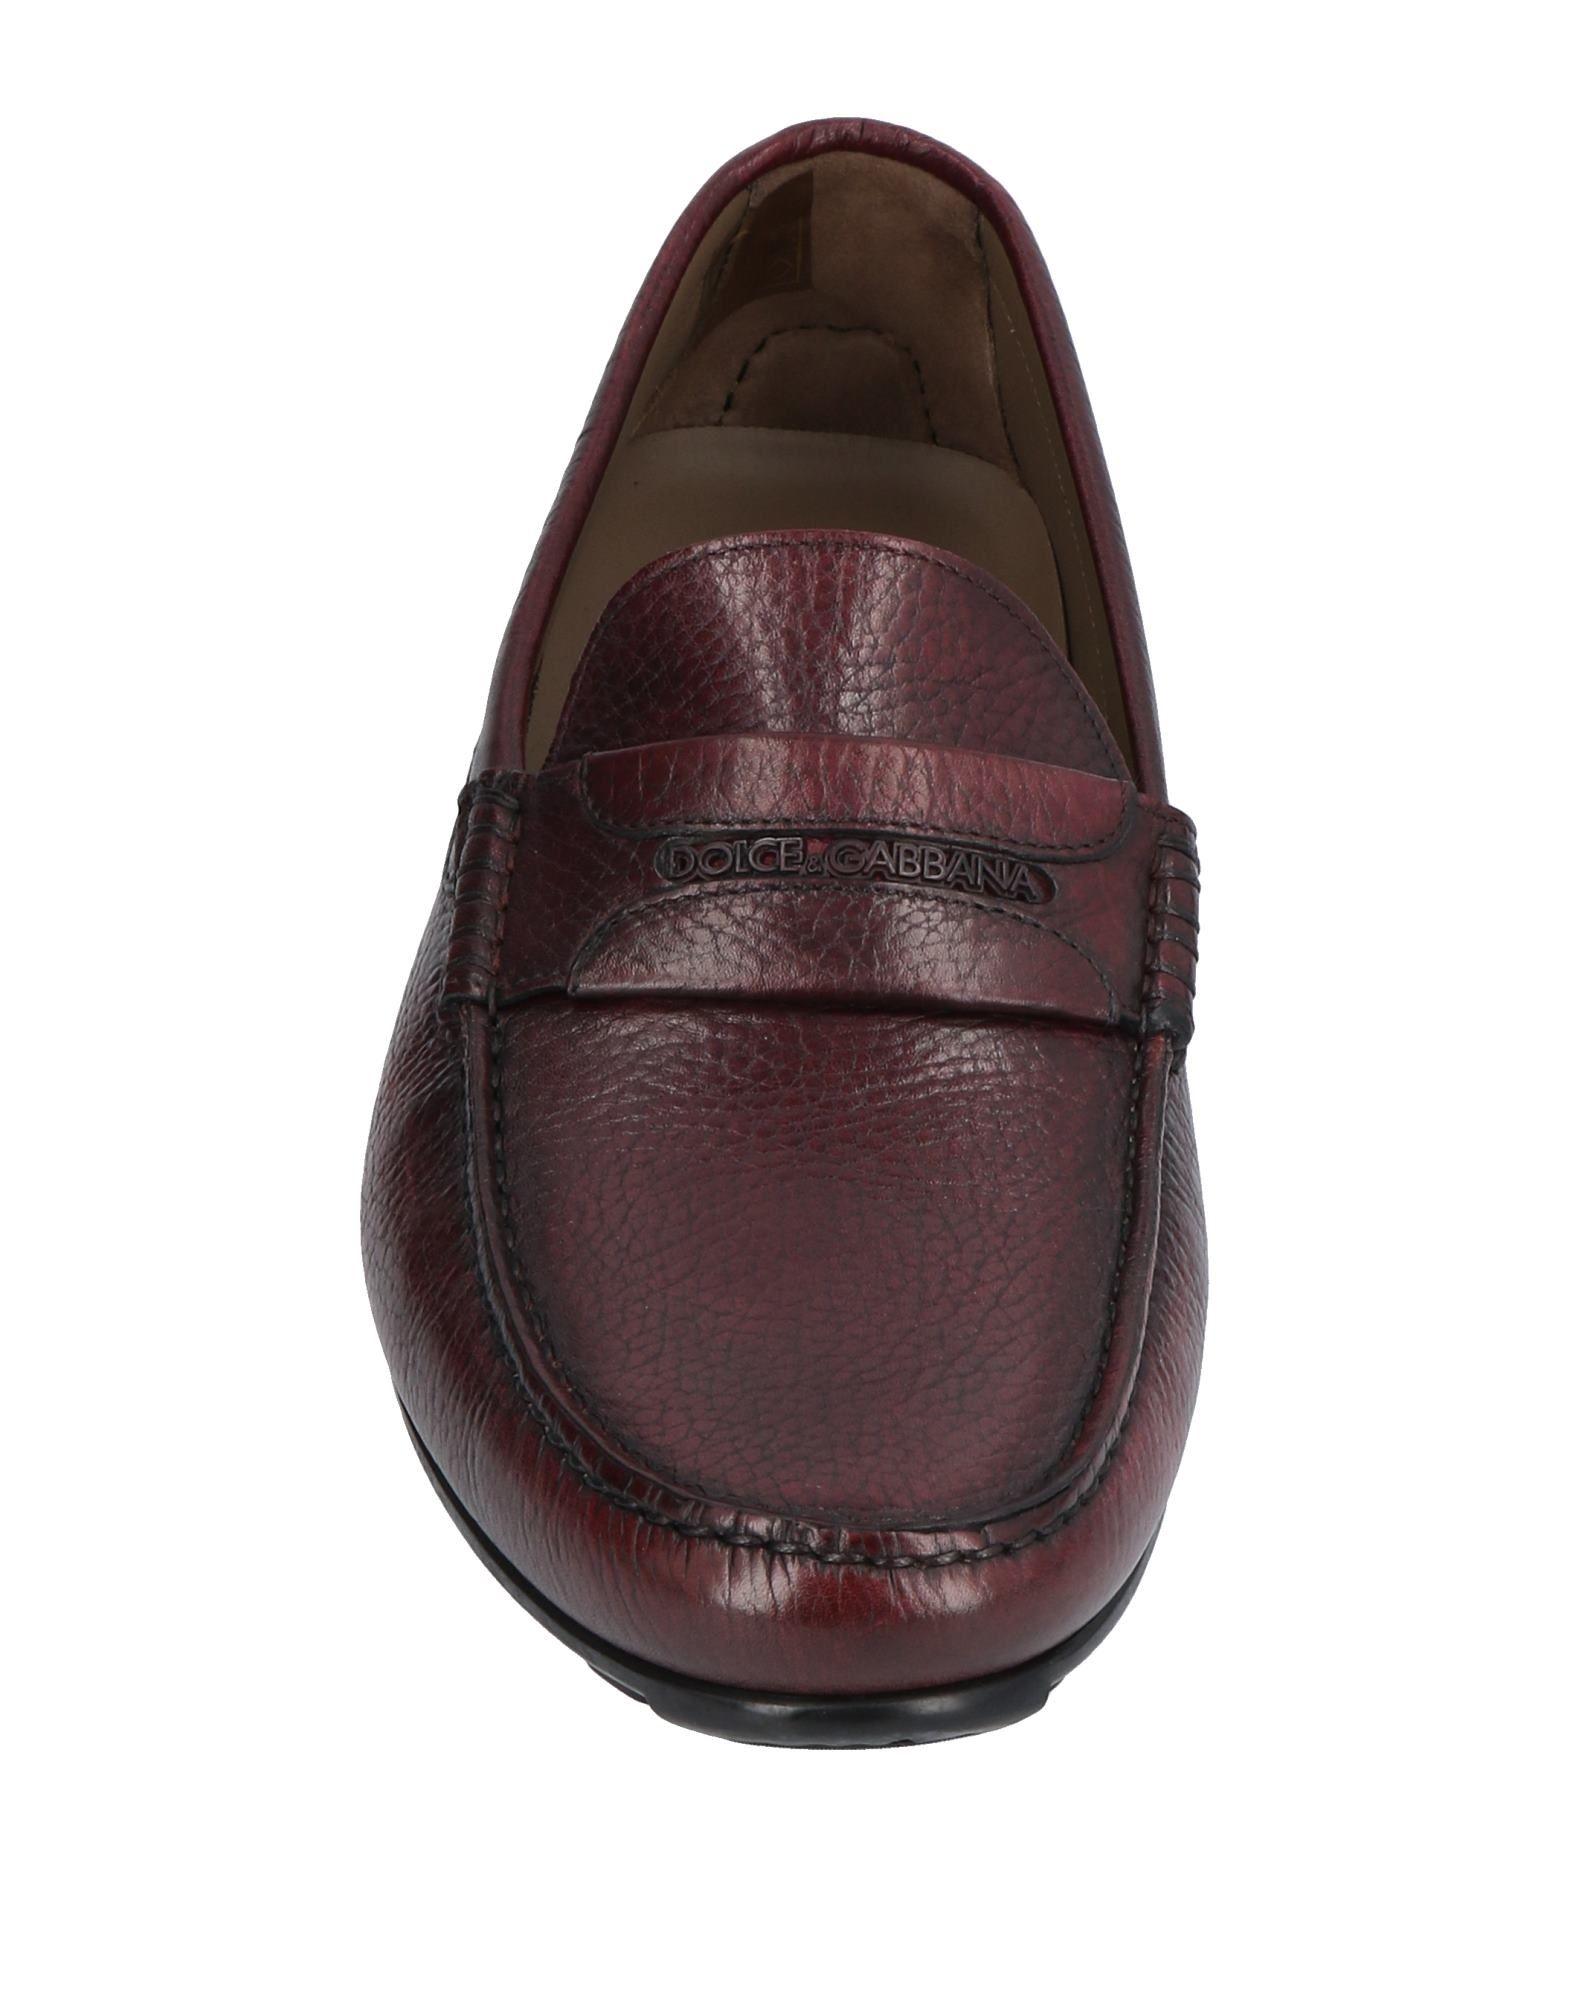 Dolce & Gabbana Mokassins Herren  11165144NJ Gute Qualität beliebte Schuhe